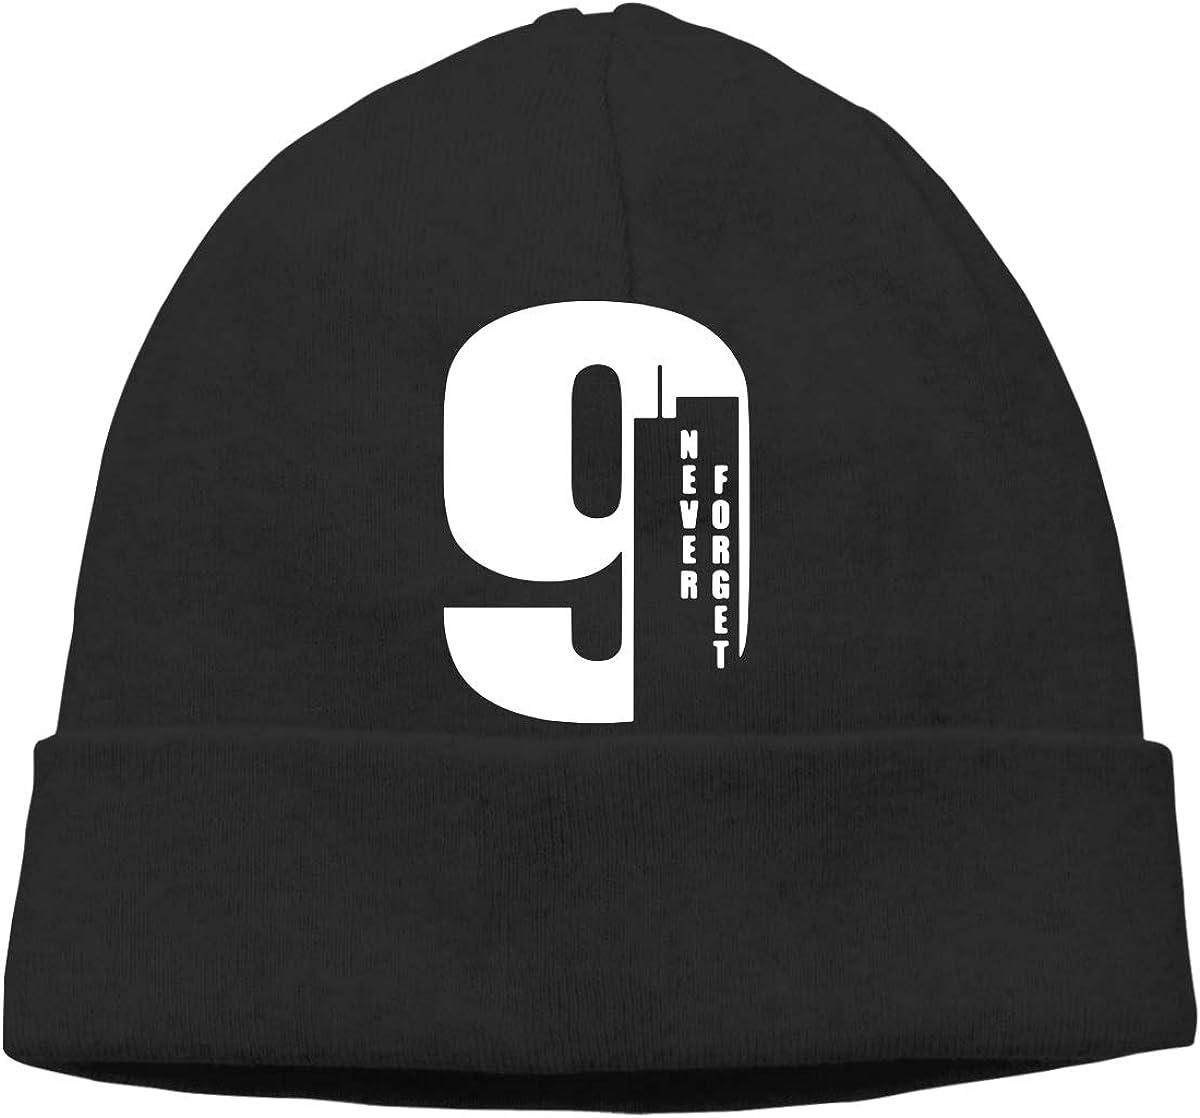 GDSG5/&4 Funny 911 Never Forget Men Women Quick Dry Sports Beanie Hat